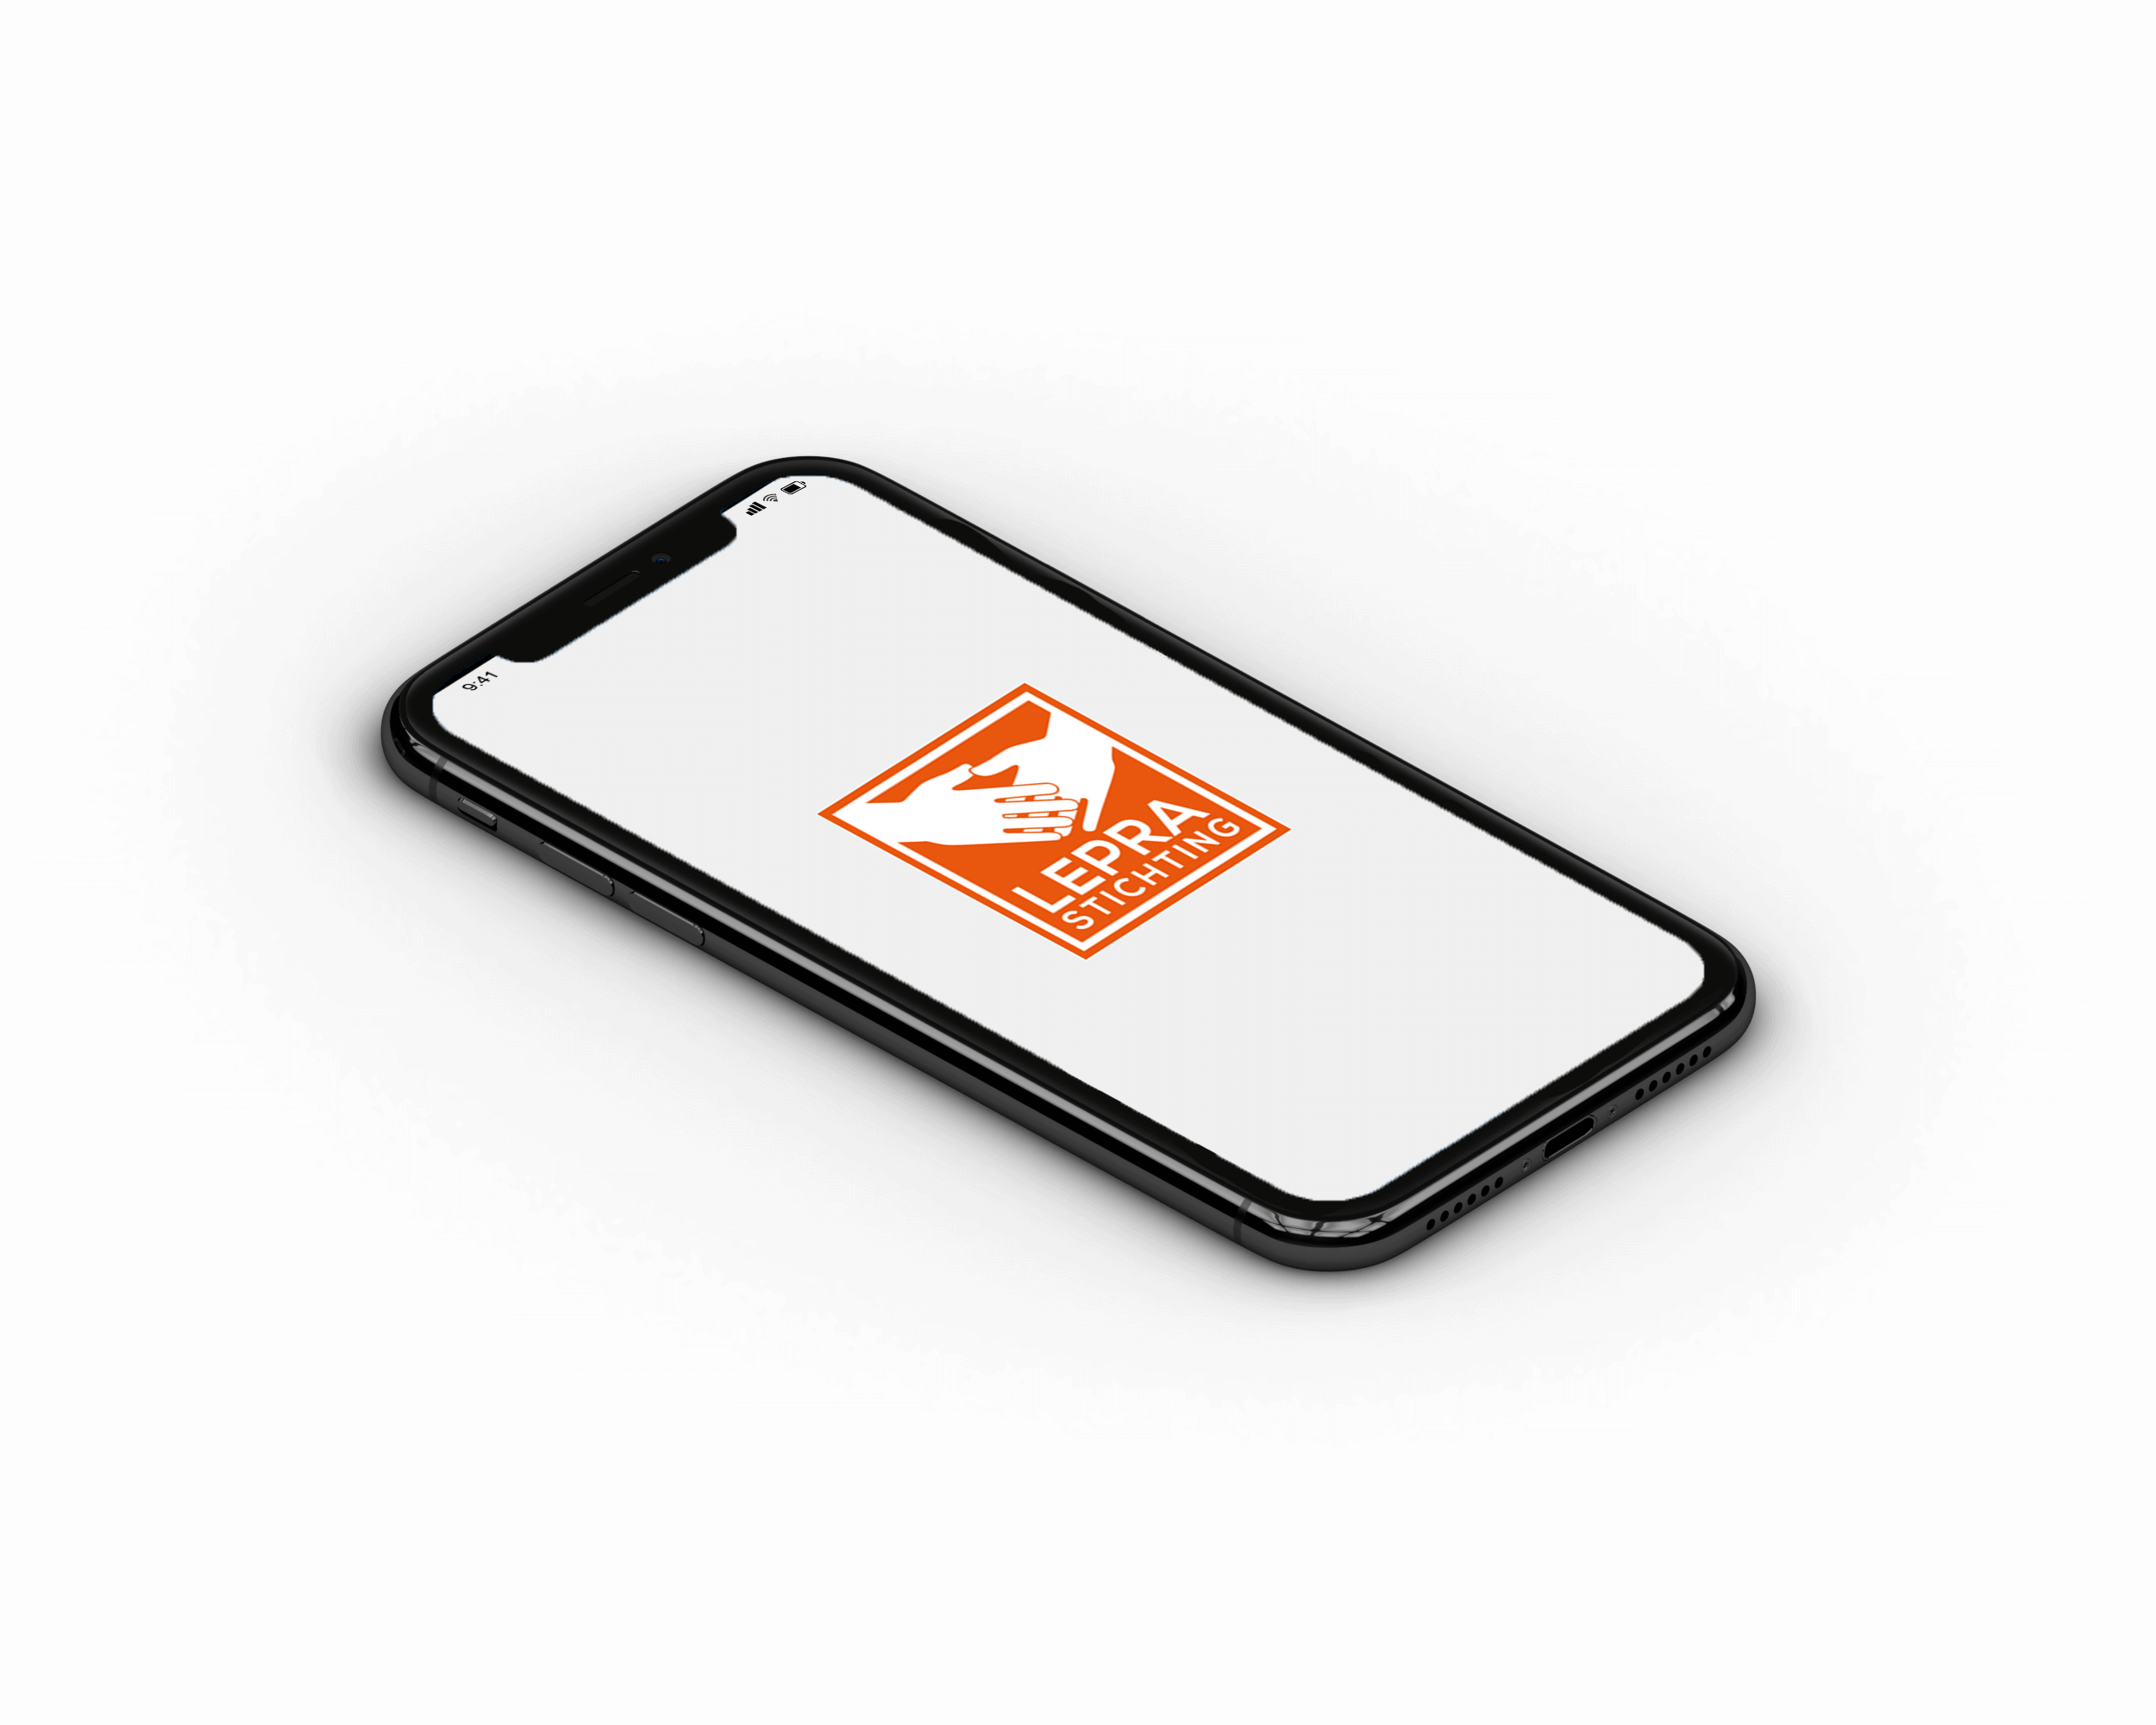 mobiele skin app voor lepra stichting